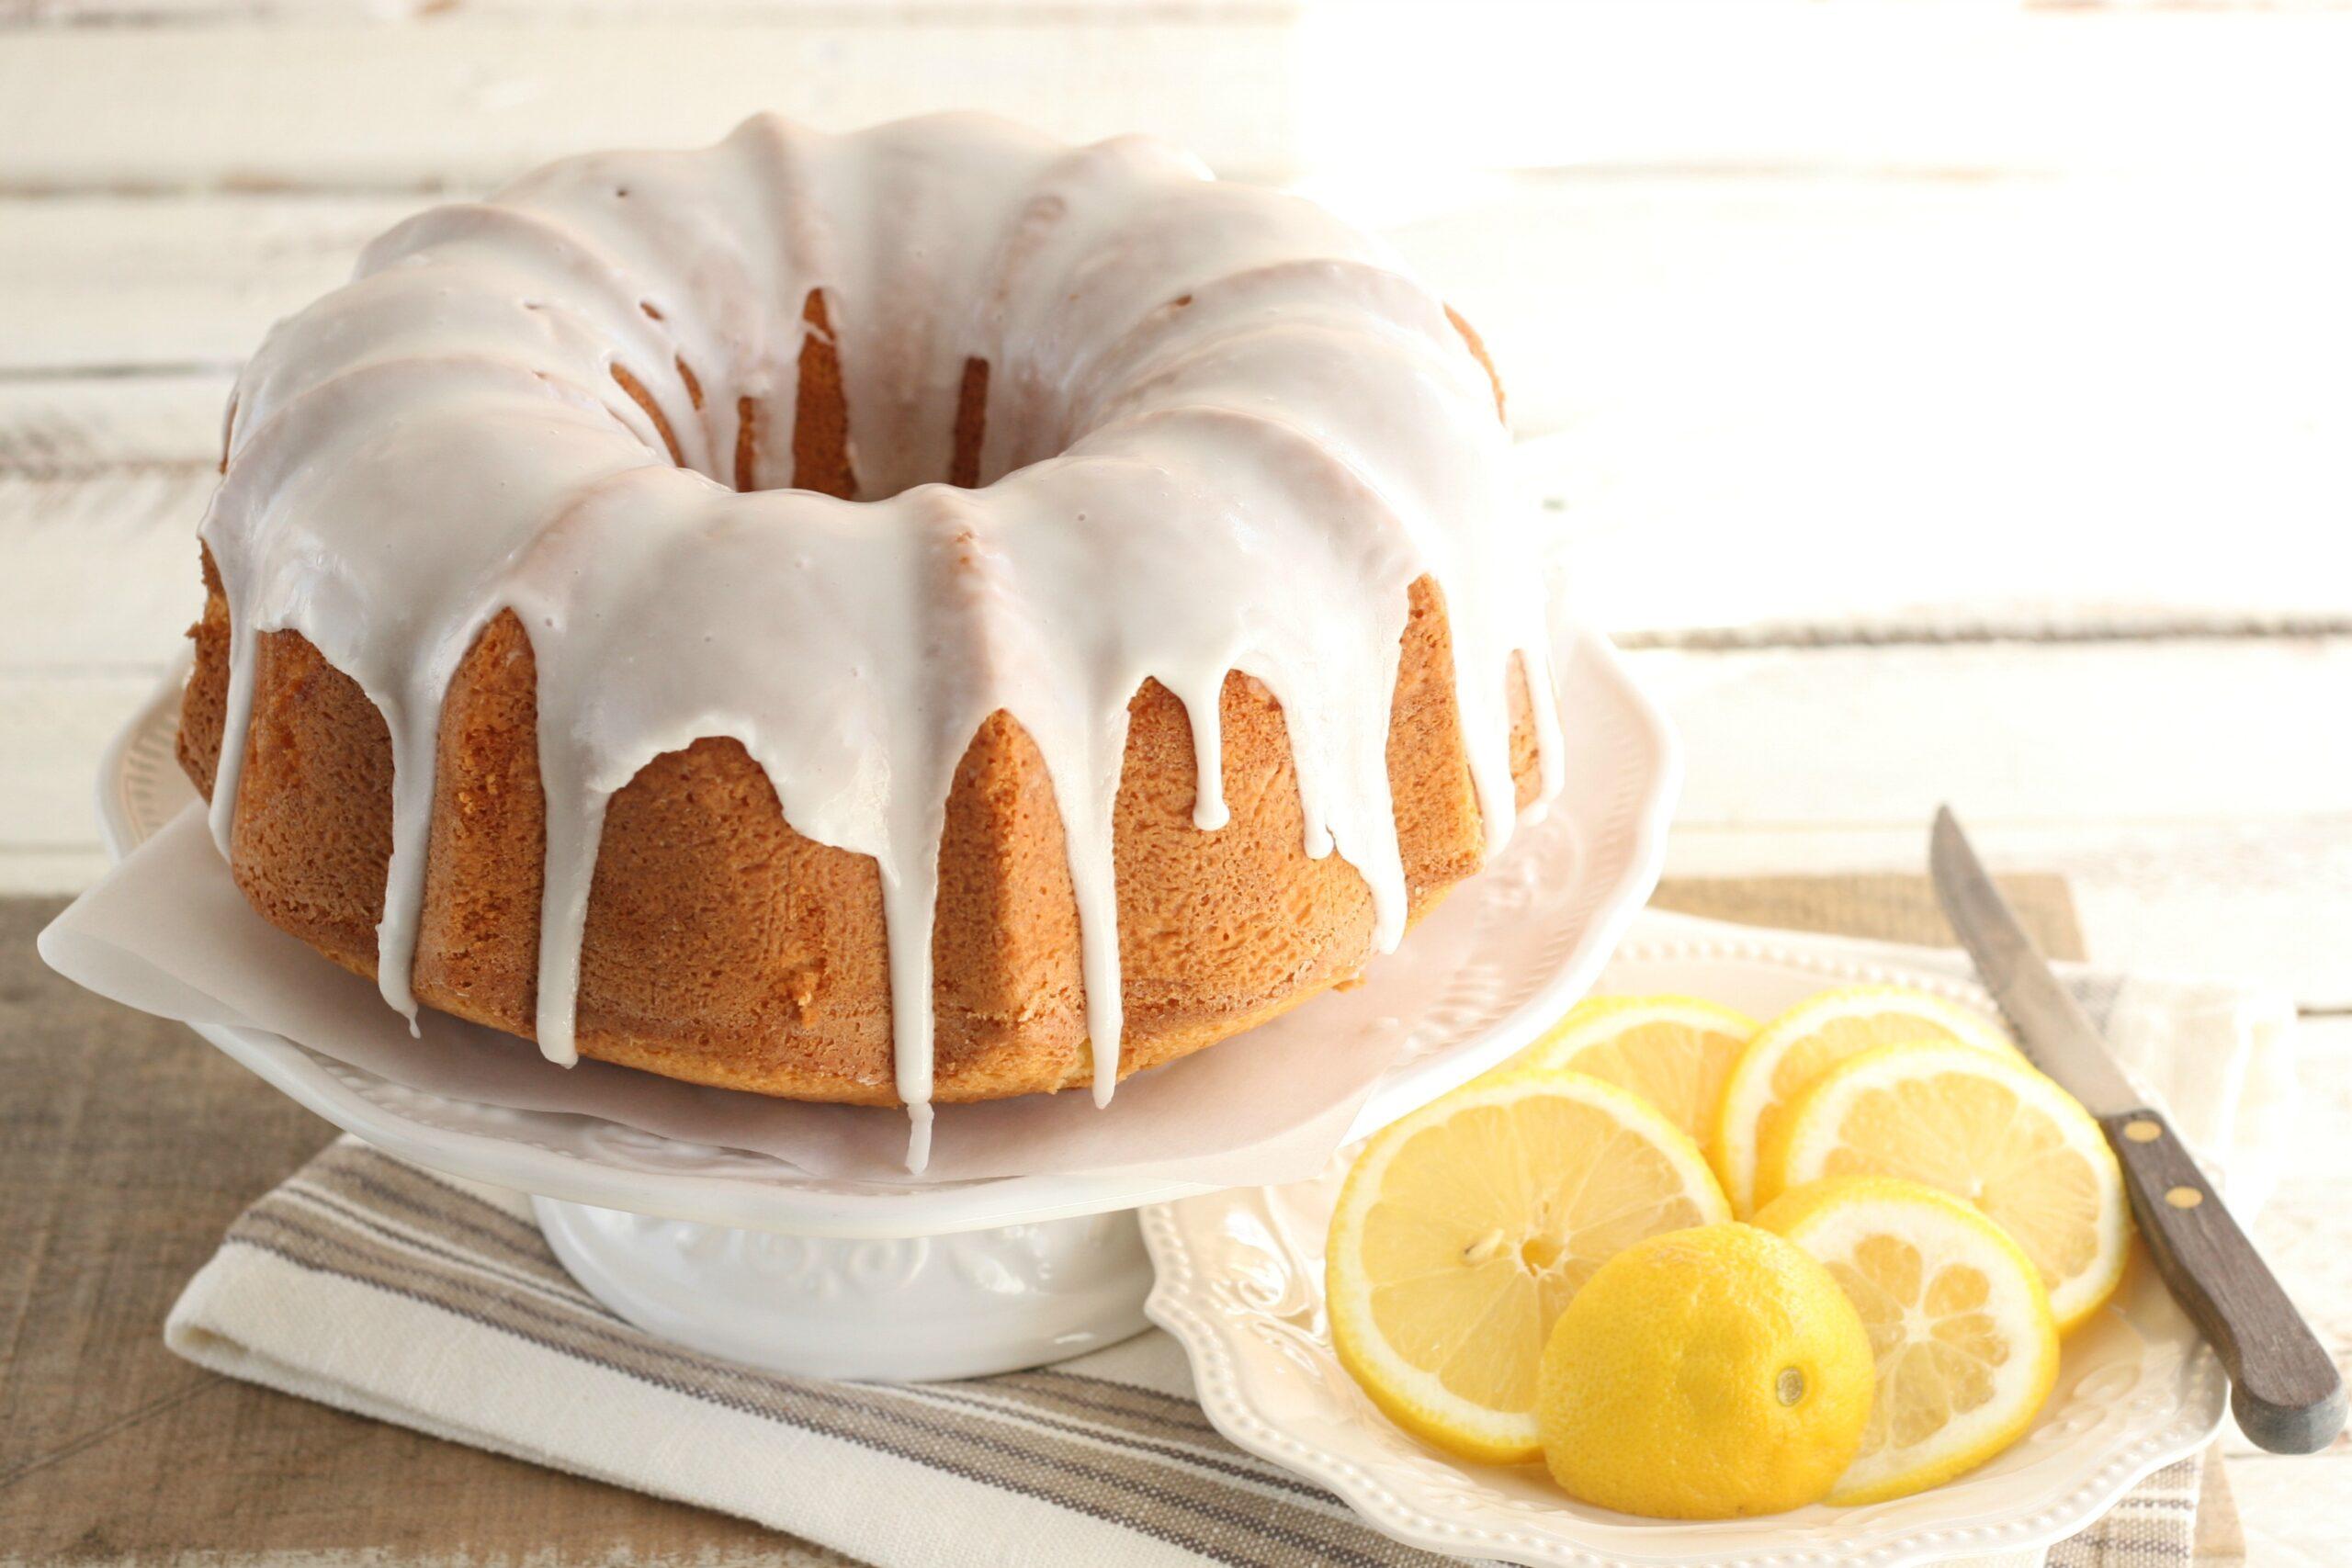 Lemon Bundt cake with icing down sides on white footed cake dish, slices of lemons.